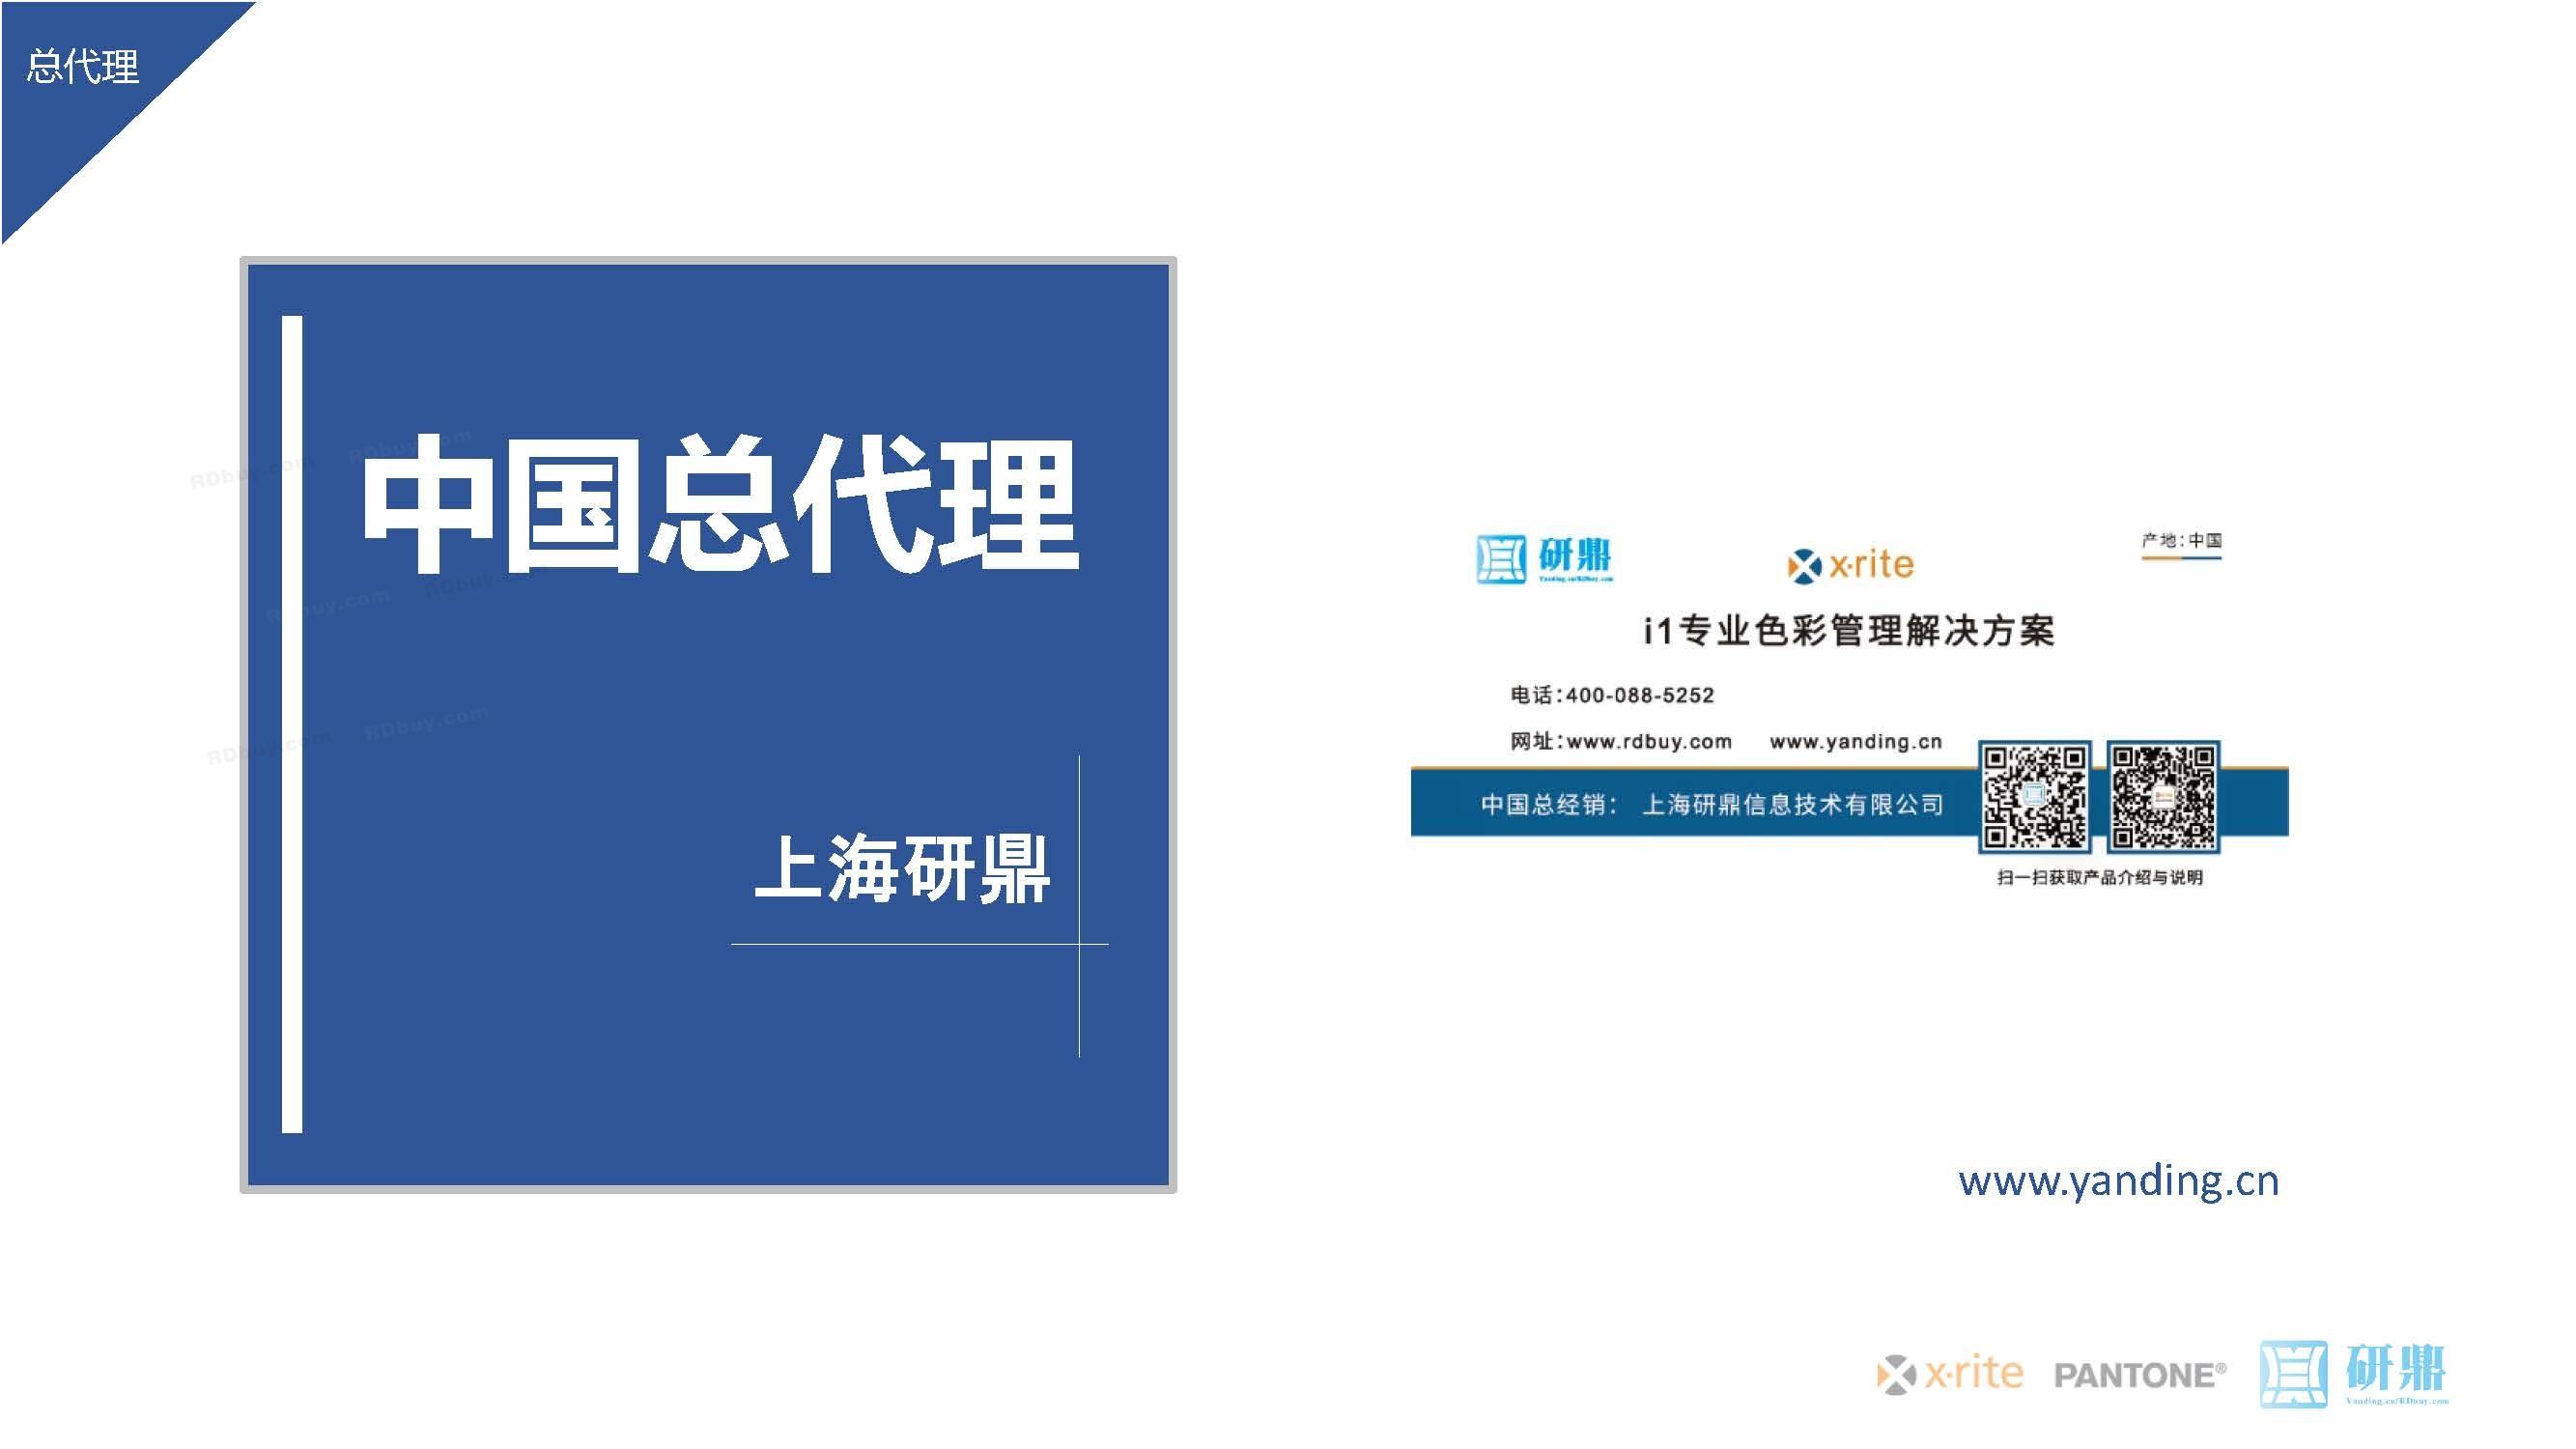 X-rite使用教程· - 加水印_页面_46.jpg